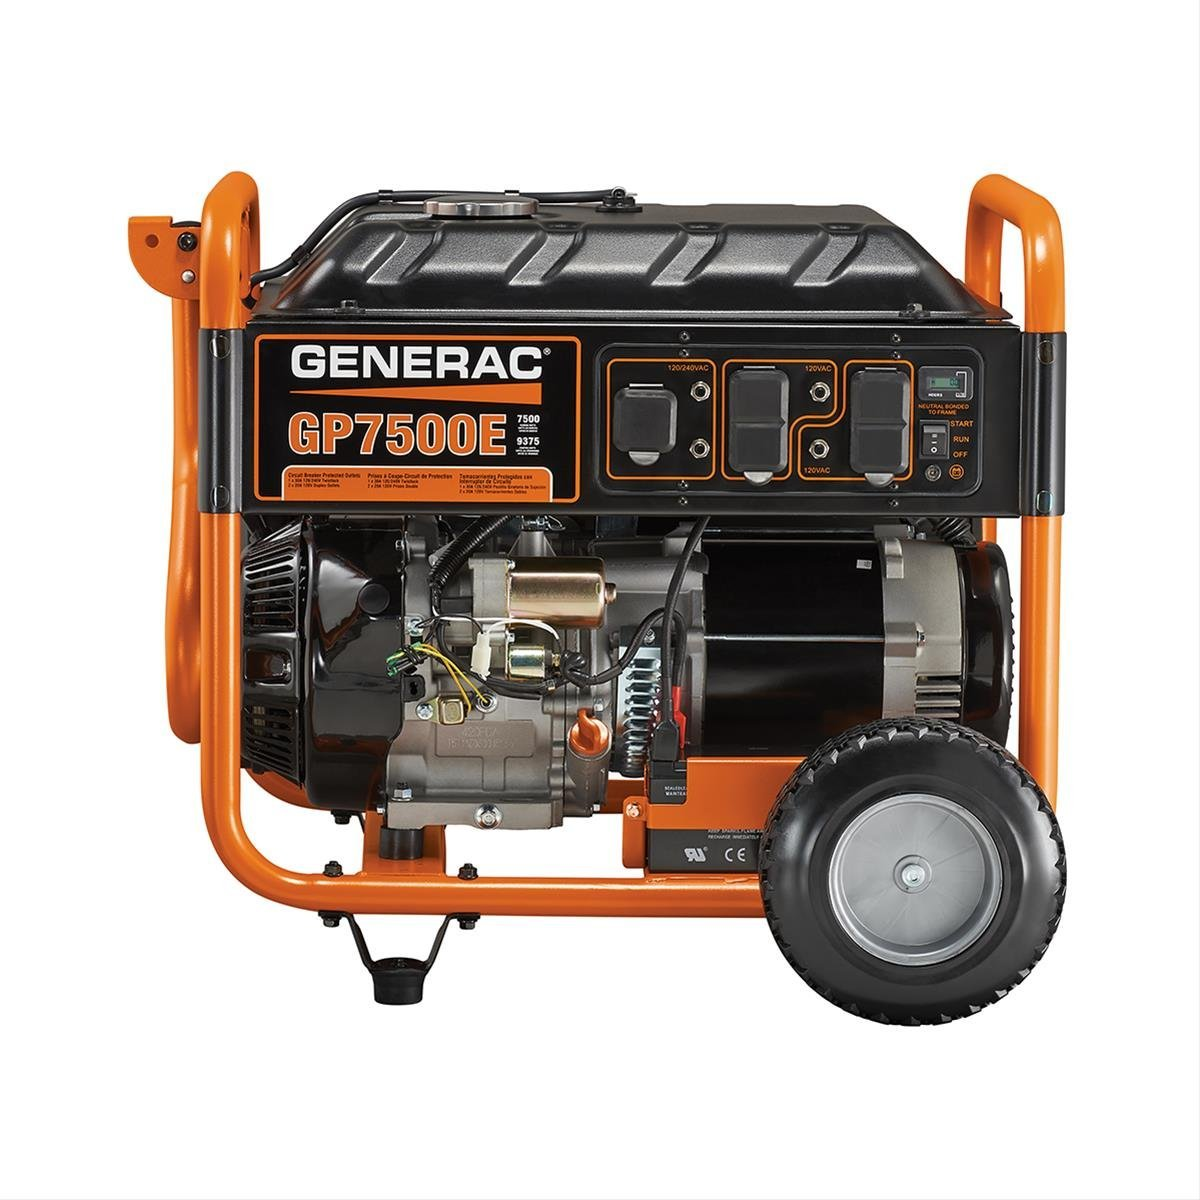 hight resolution of get quotations generac 5978 gp7500e 7500 running watts 9375 starting watts electric start gas powered portable generator